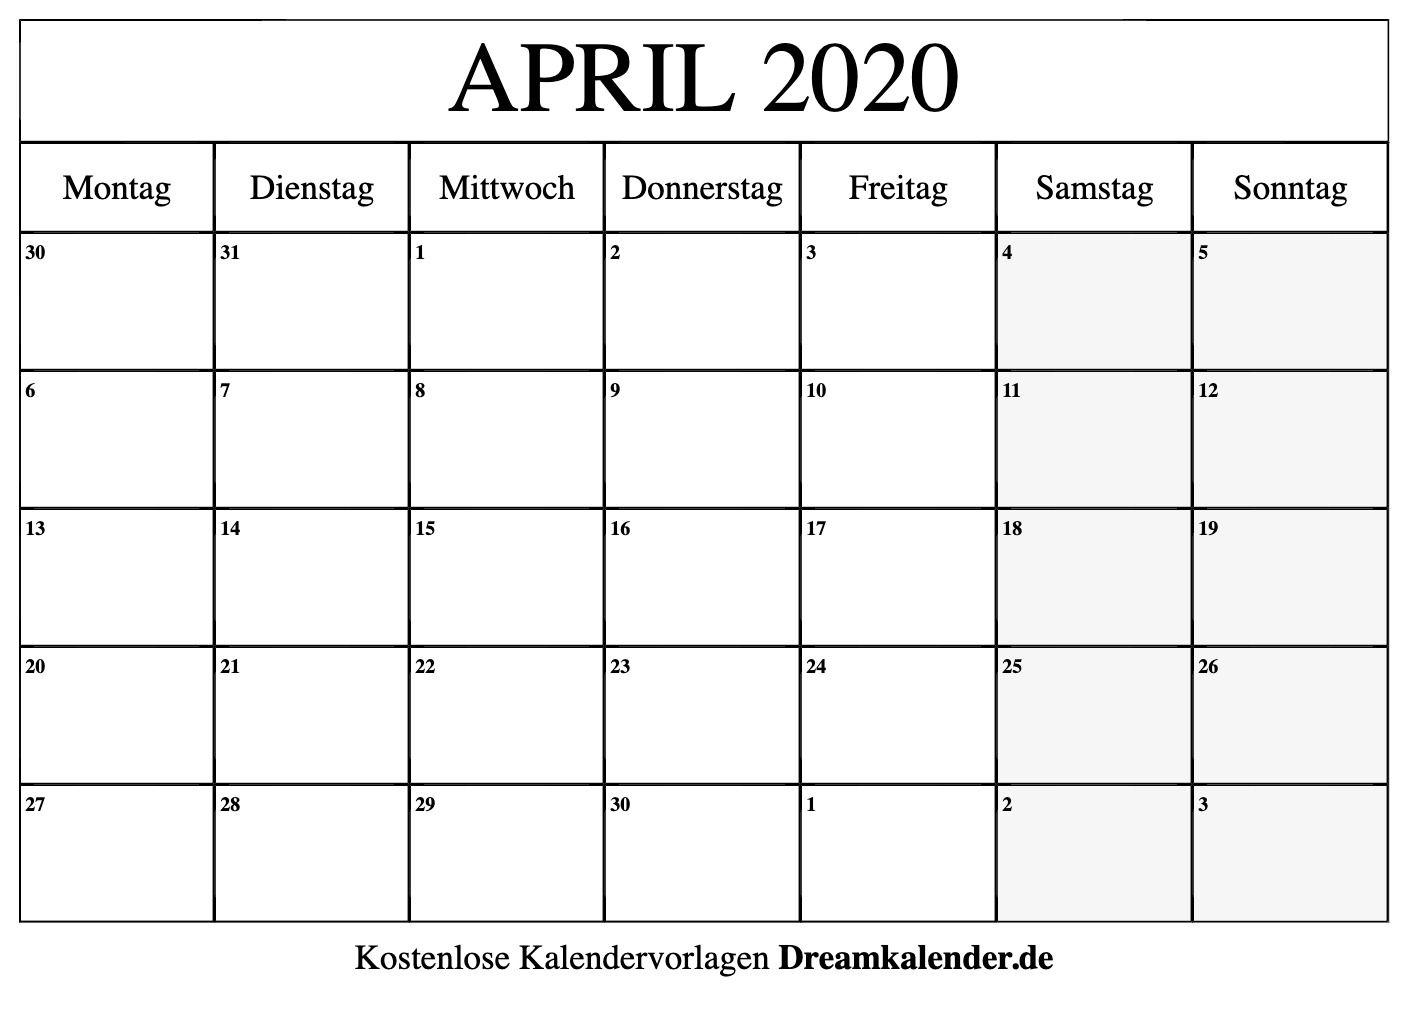 April 2020 Kalender Zum Ausdrucken - Dream Kalender